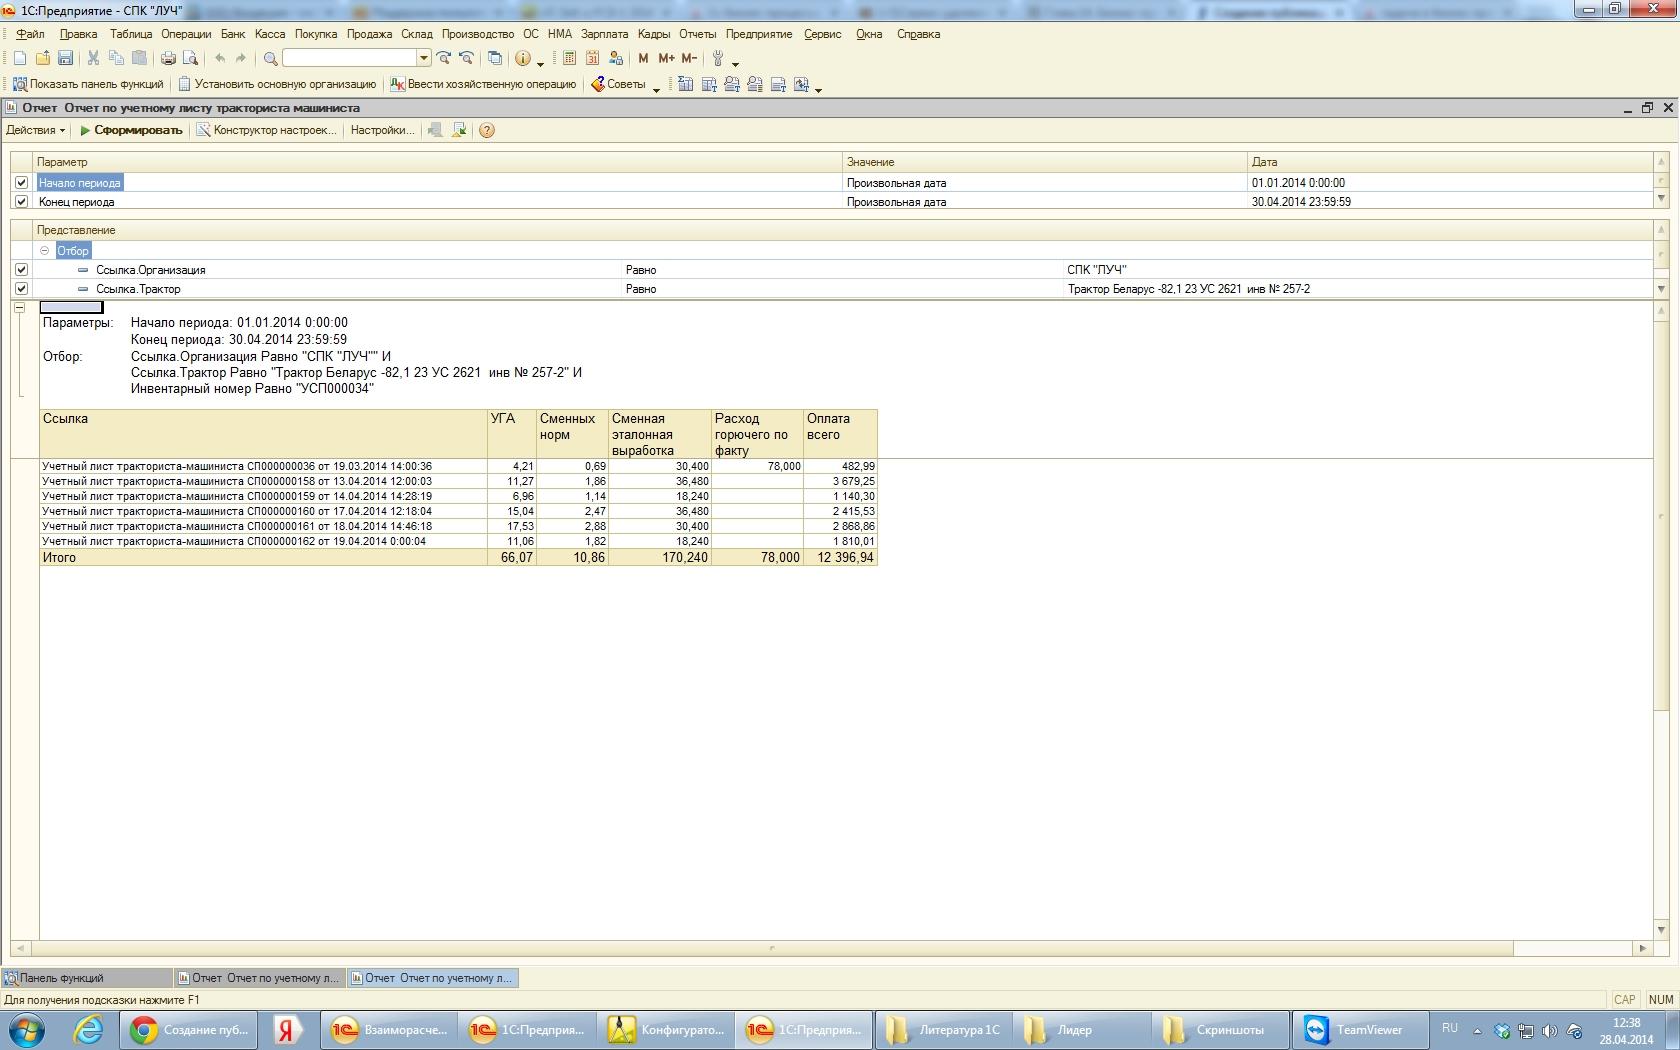 Отчет по учетному листу тракториста машиниста для БСХП 2.0 и БСХП 3.0